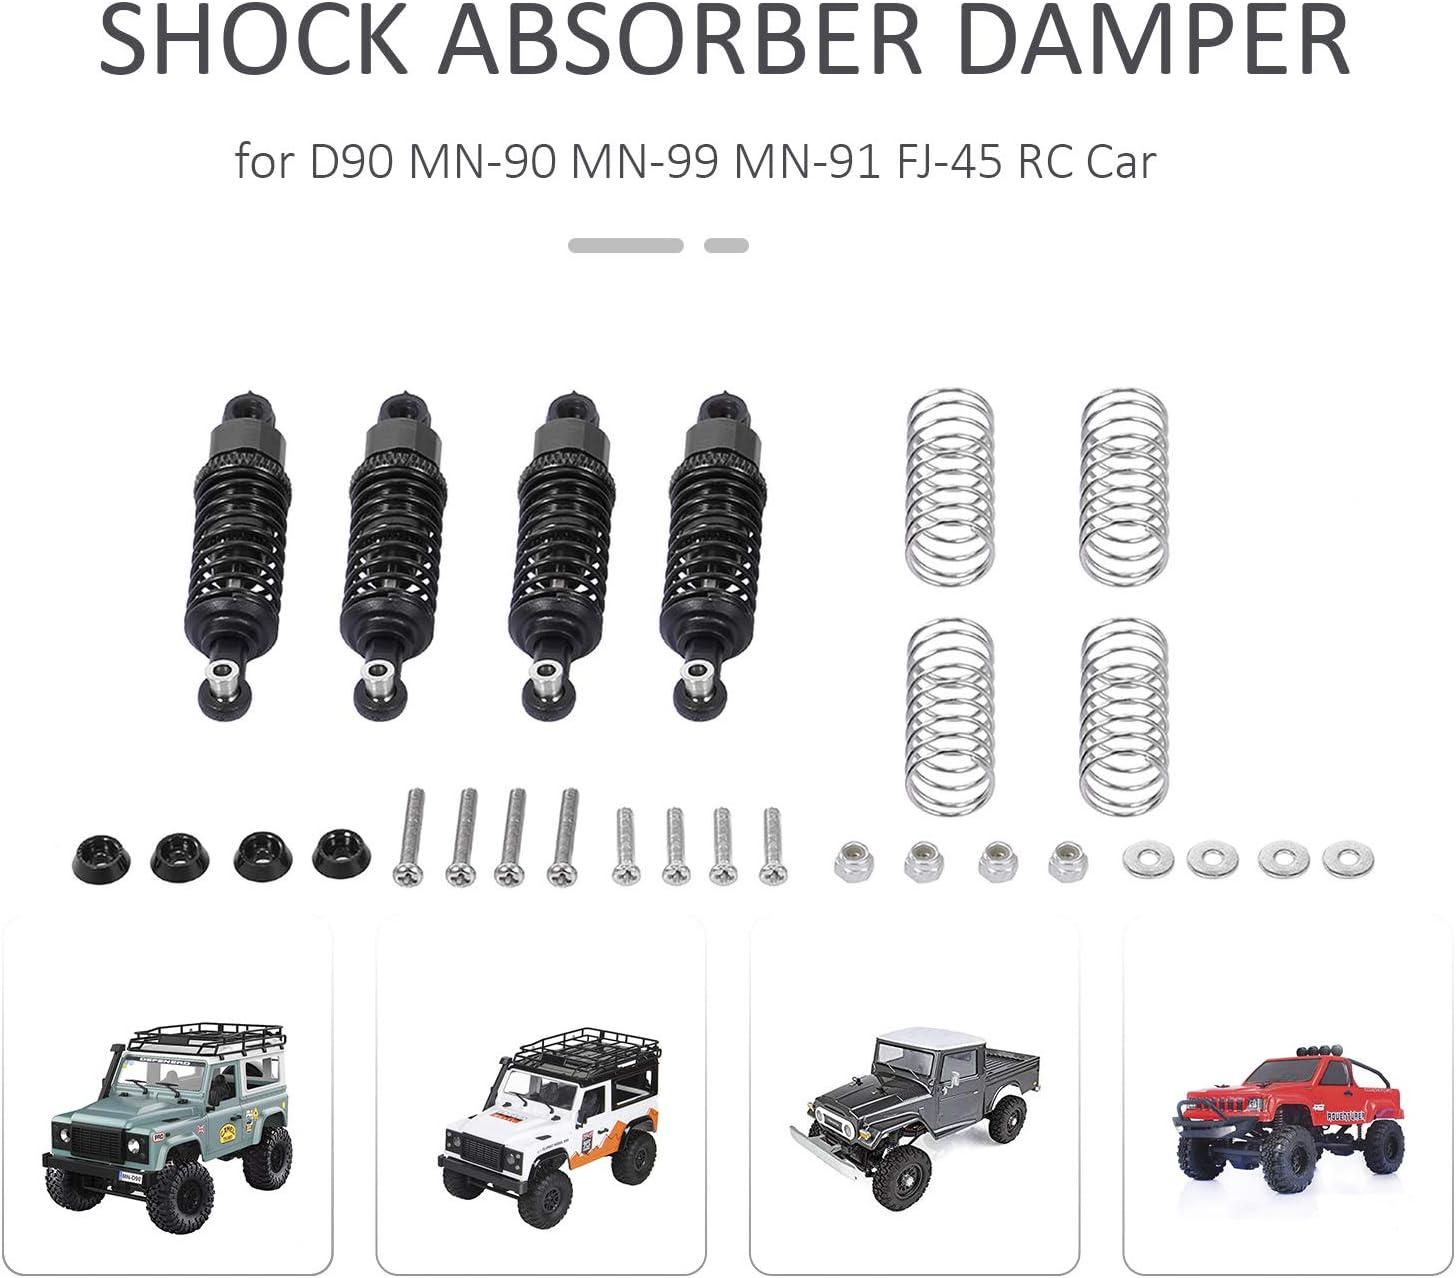 Godyluck Aluminum Alloy Metal Shock Absorber Damper for D90 MN-90 MN-99 MN-91 FJ-45 RC Car 1//12 Rock Crawler Upgrade Parts